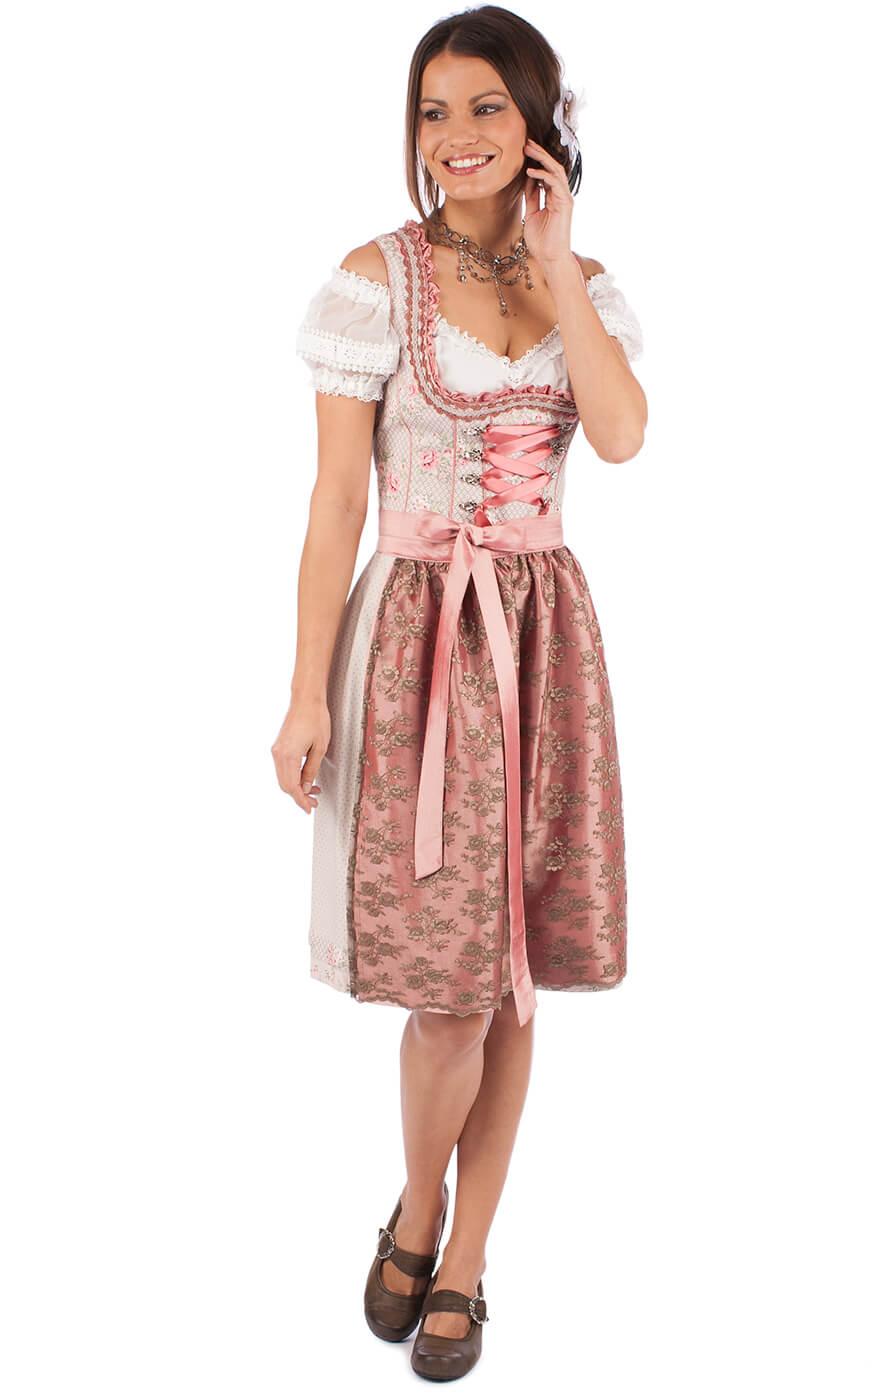 Minidirndl Grace2 2tlg. 58cm braun altrosa von Marjo